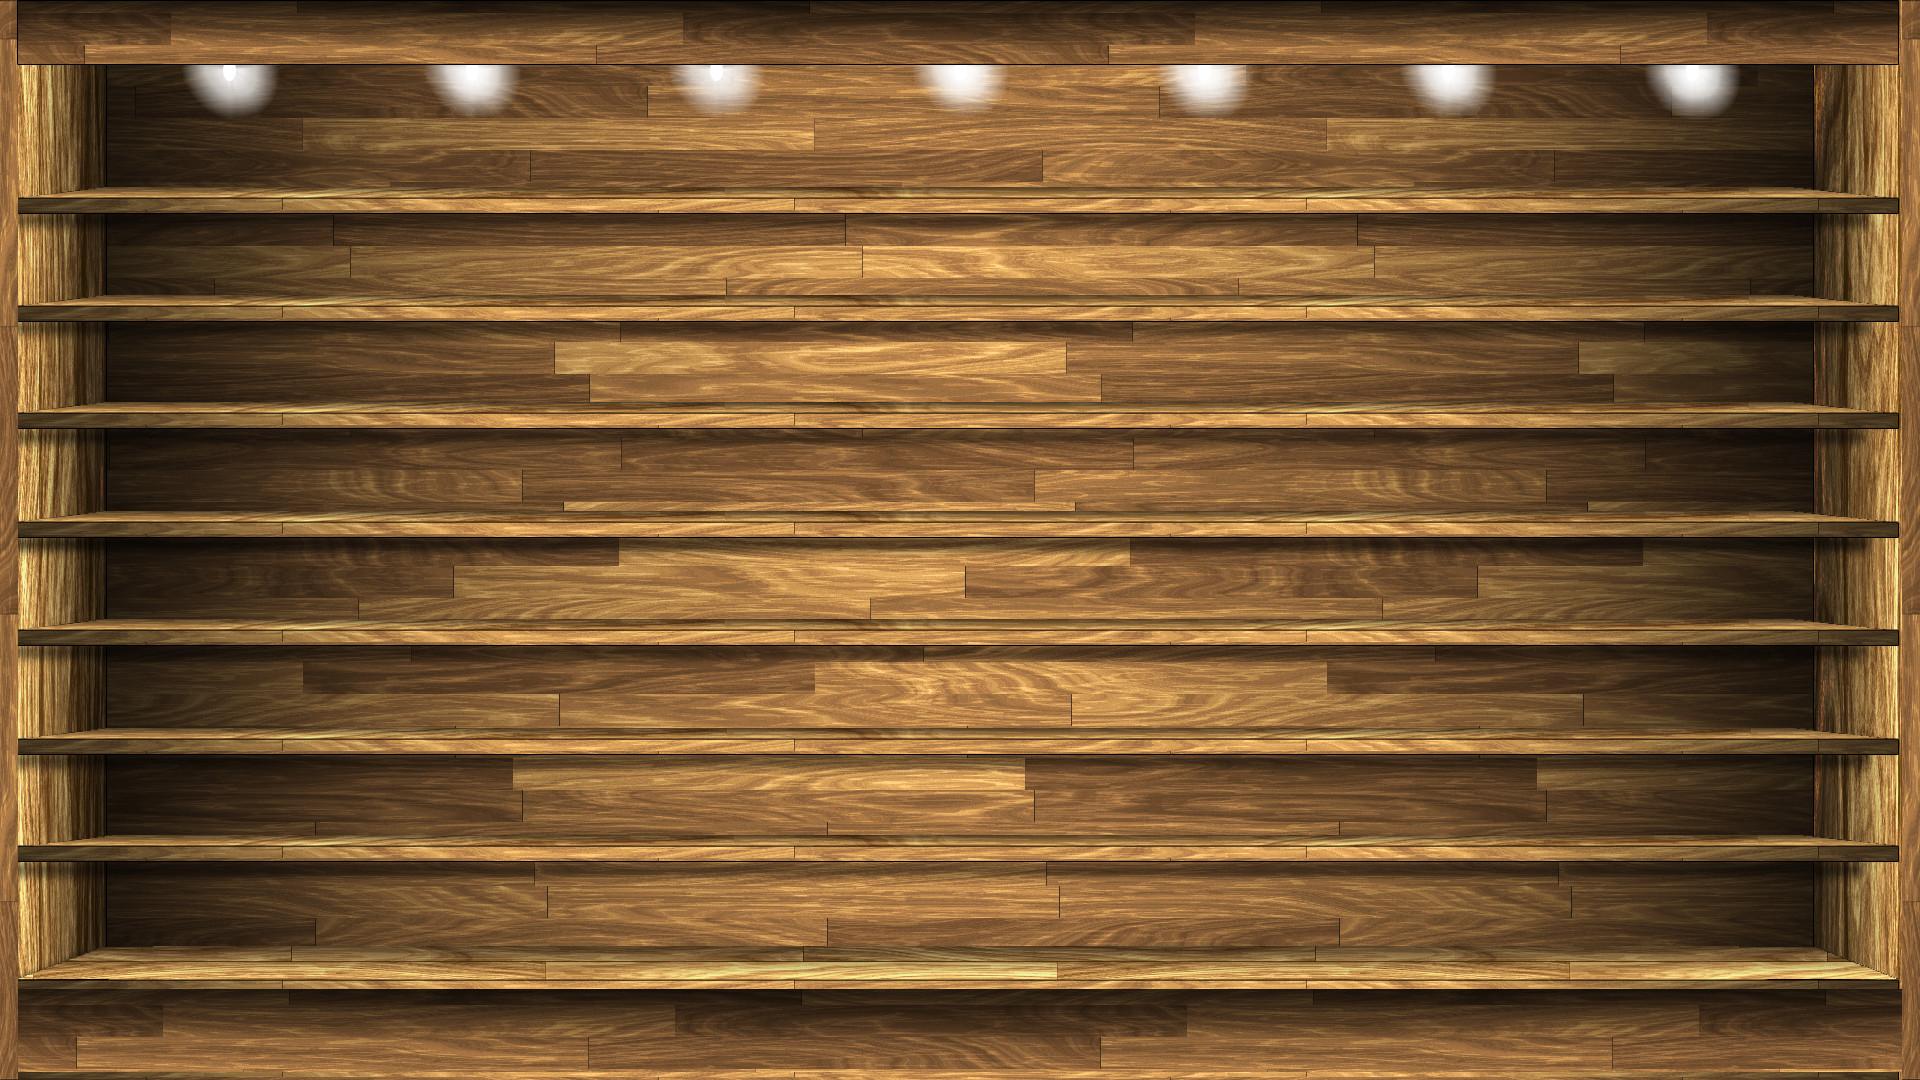 Shelves Wallpaper Source · Desk and Shelves Desktop Wallpaper  WallpaperSafari